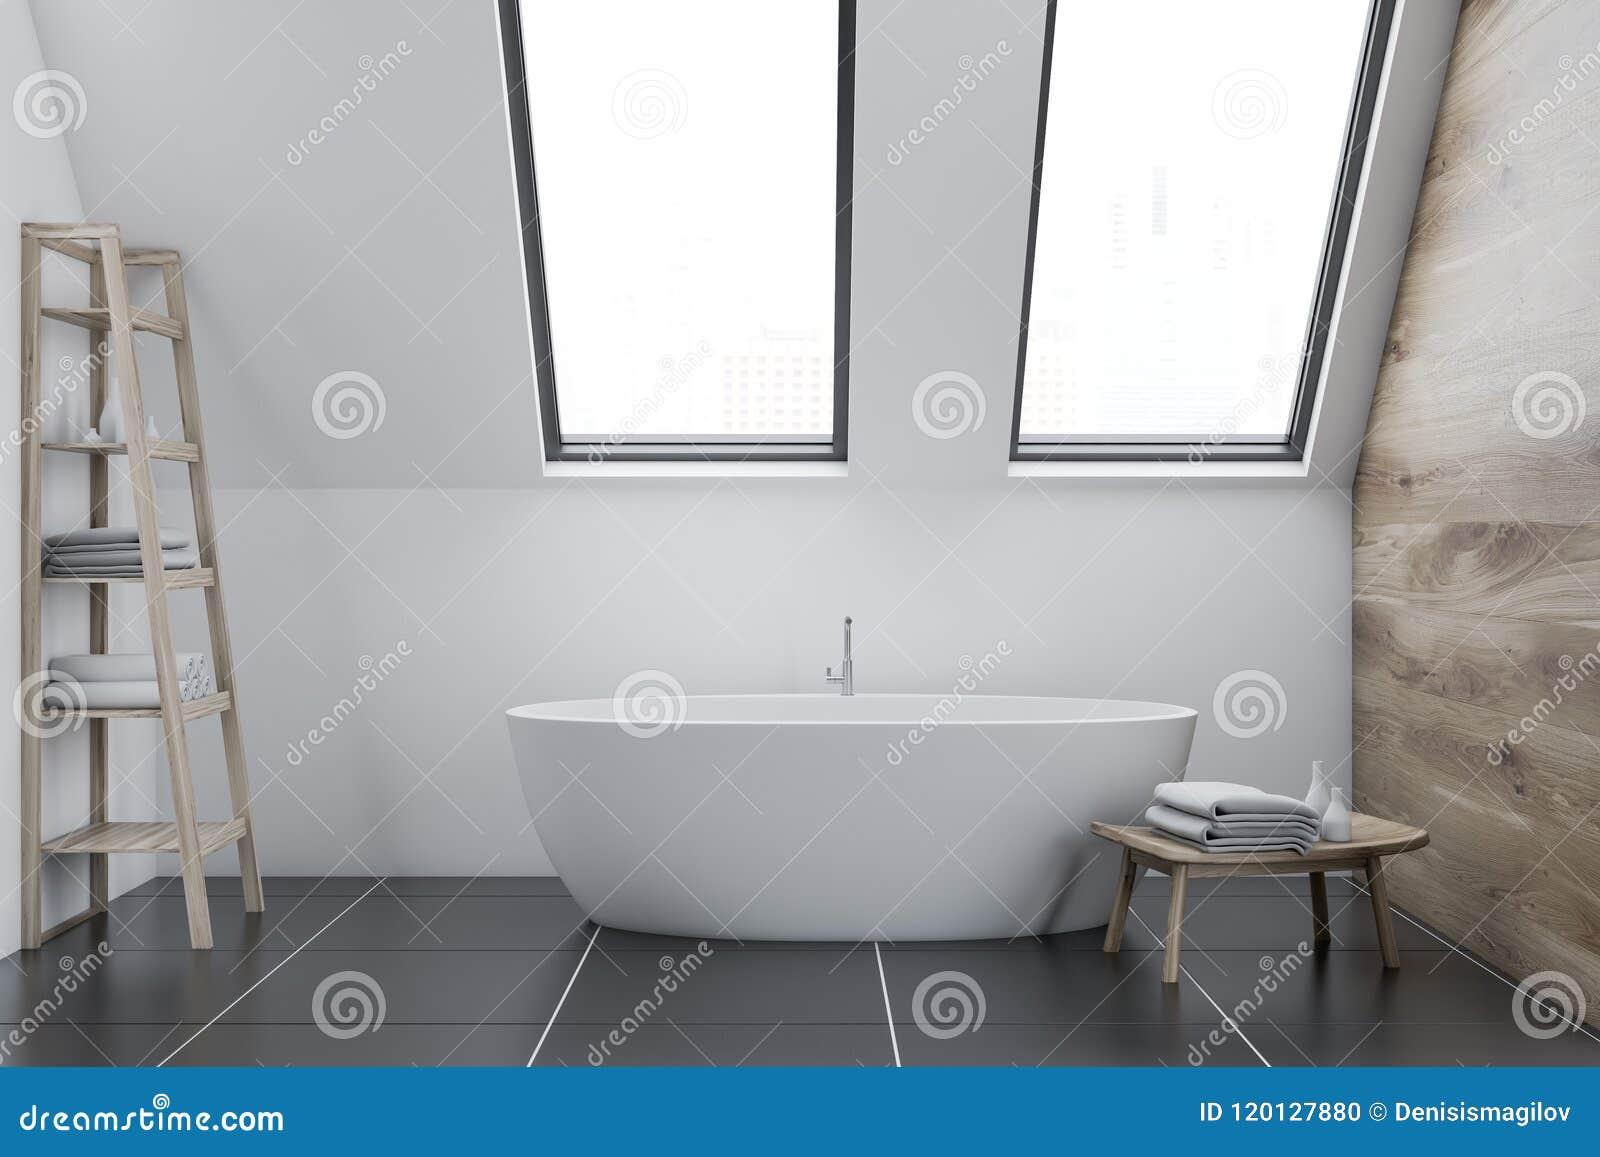 Attic White Bathroom Interior, Shelf And Tub Stock Illustration ...